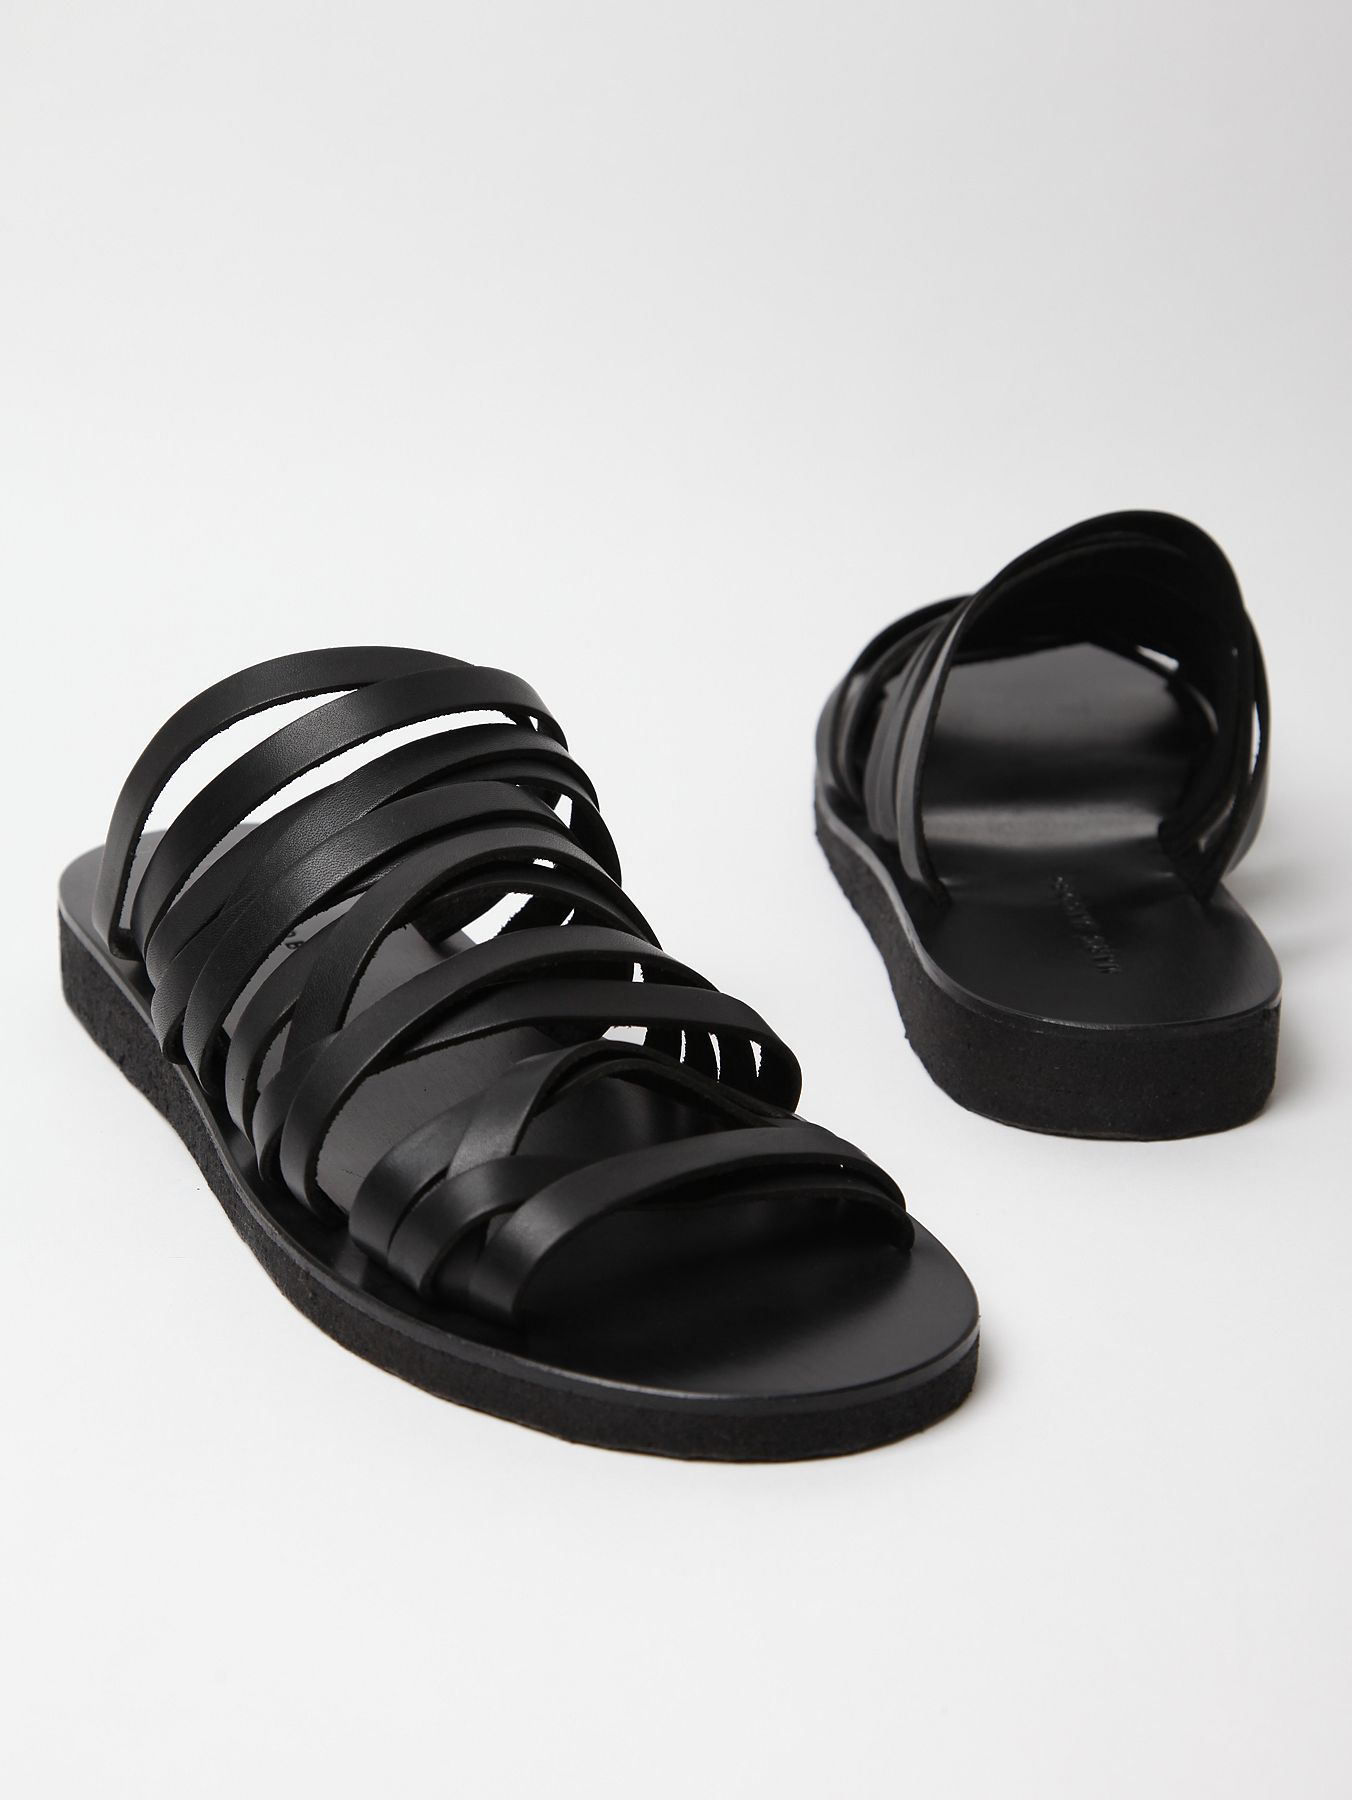 Marc jacobs mens leather strap sandal in black for men lyst for Black leather strap